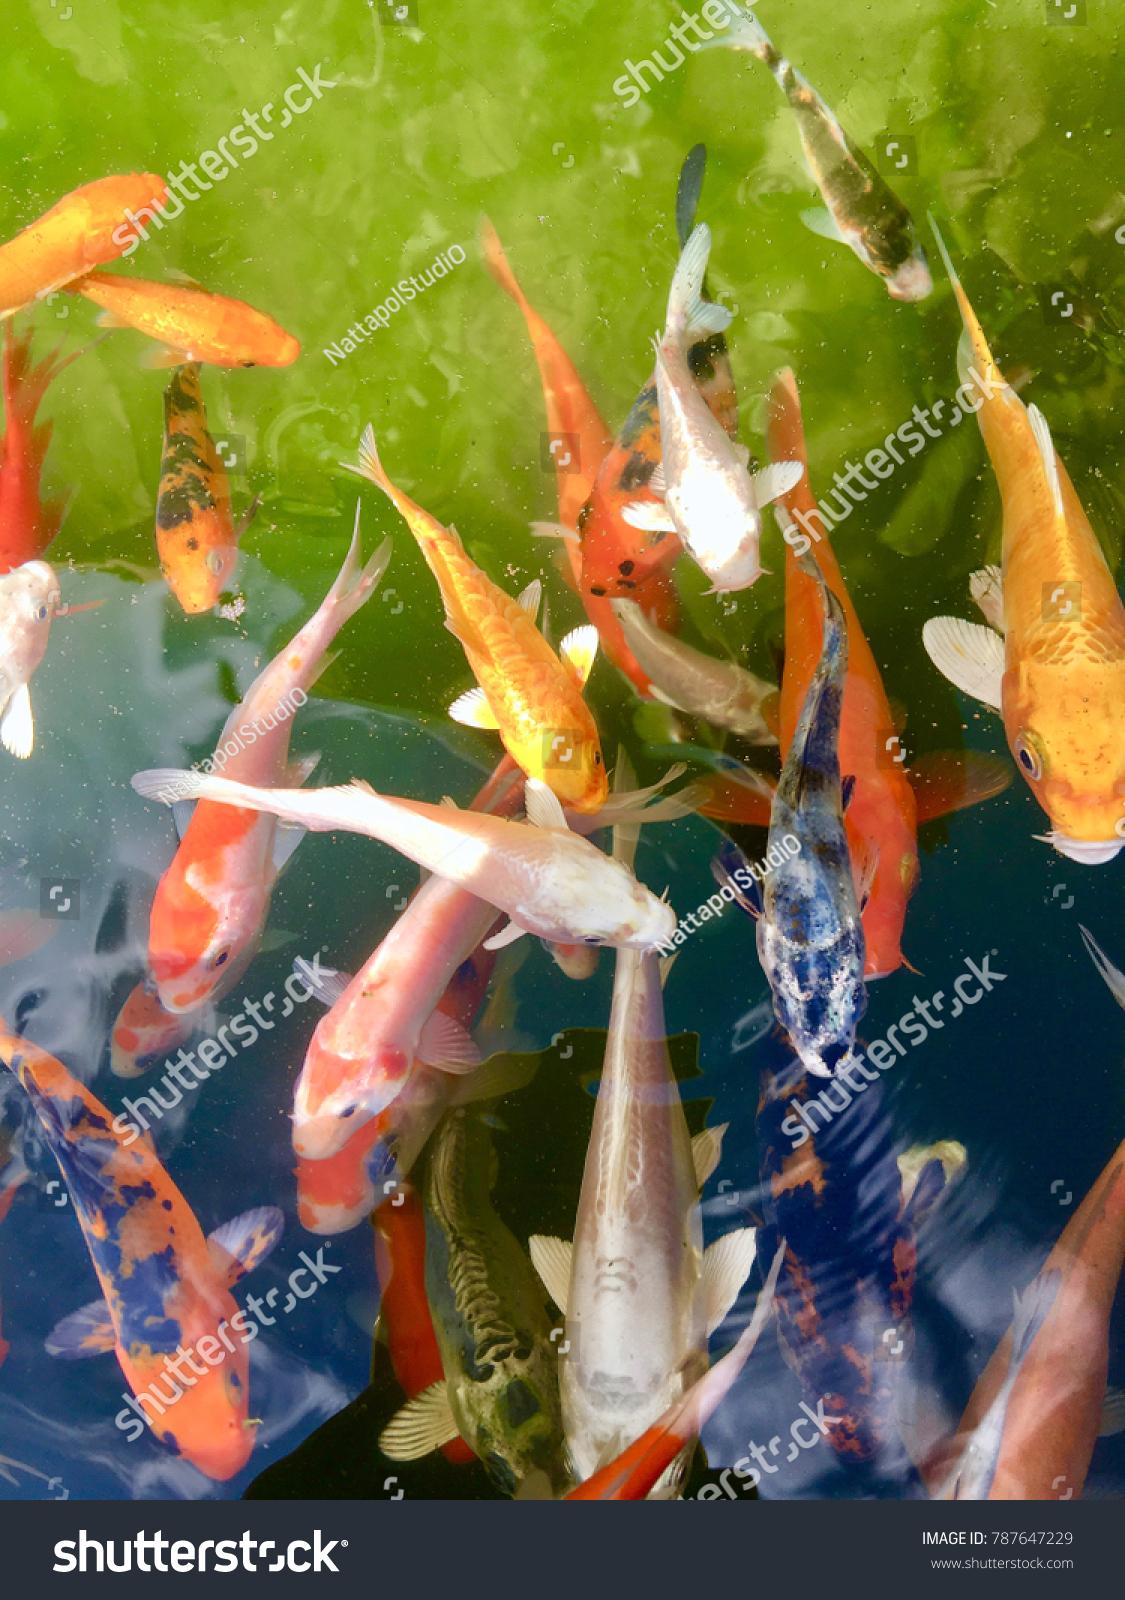 Japan Fish Call Carp Koi Fish Stock Photo (Royalty Free) 787647229 ...